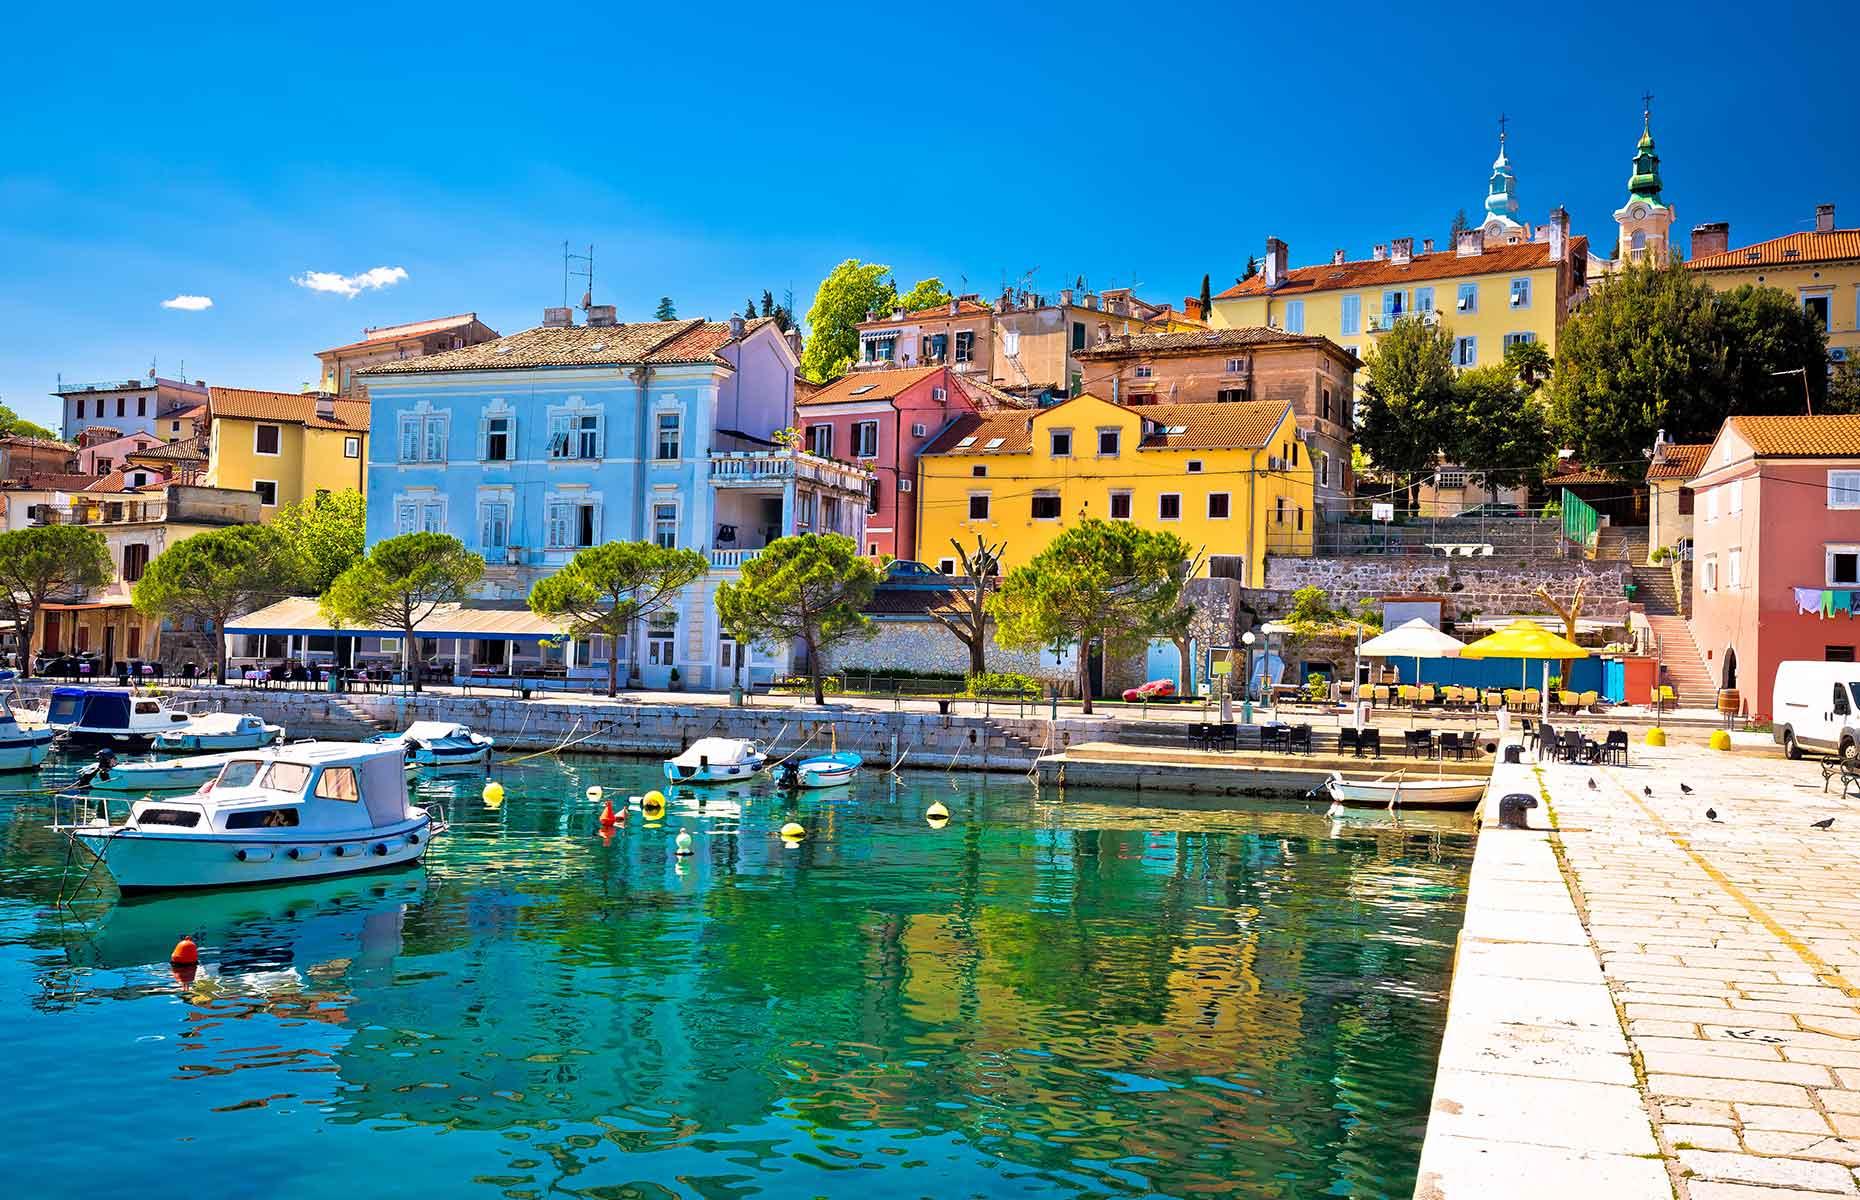 Voloska, Croatia (Image: xbrchx/Shutterstock)